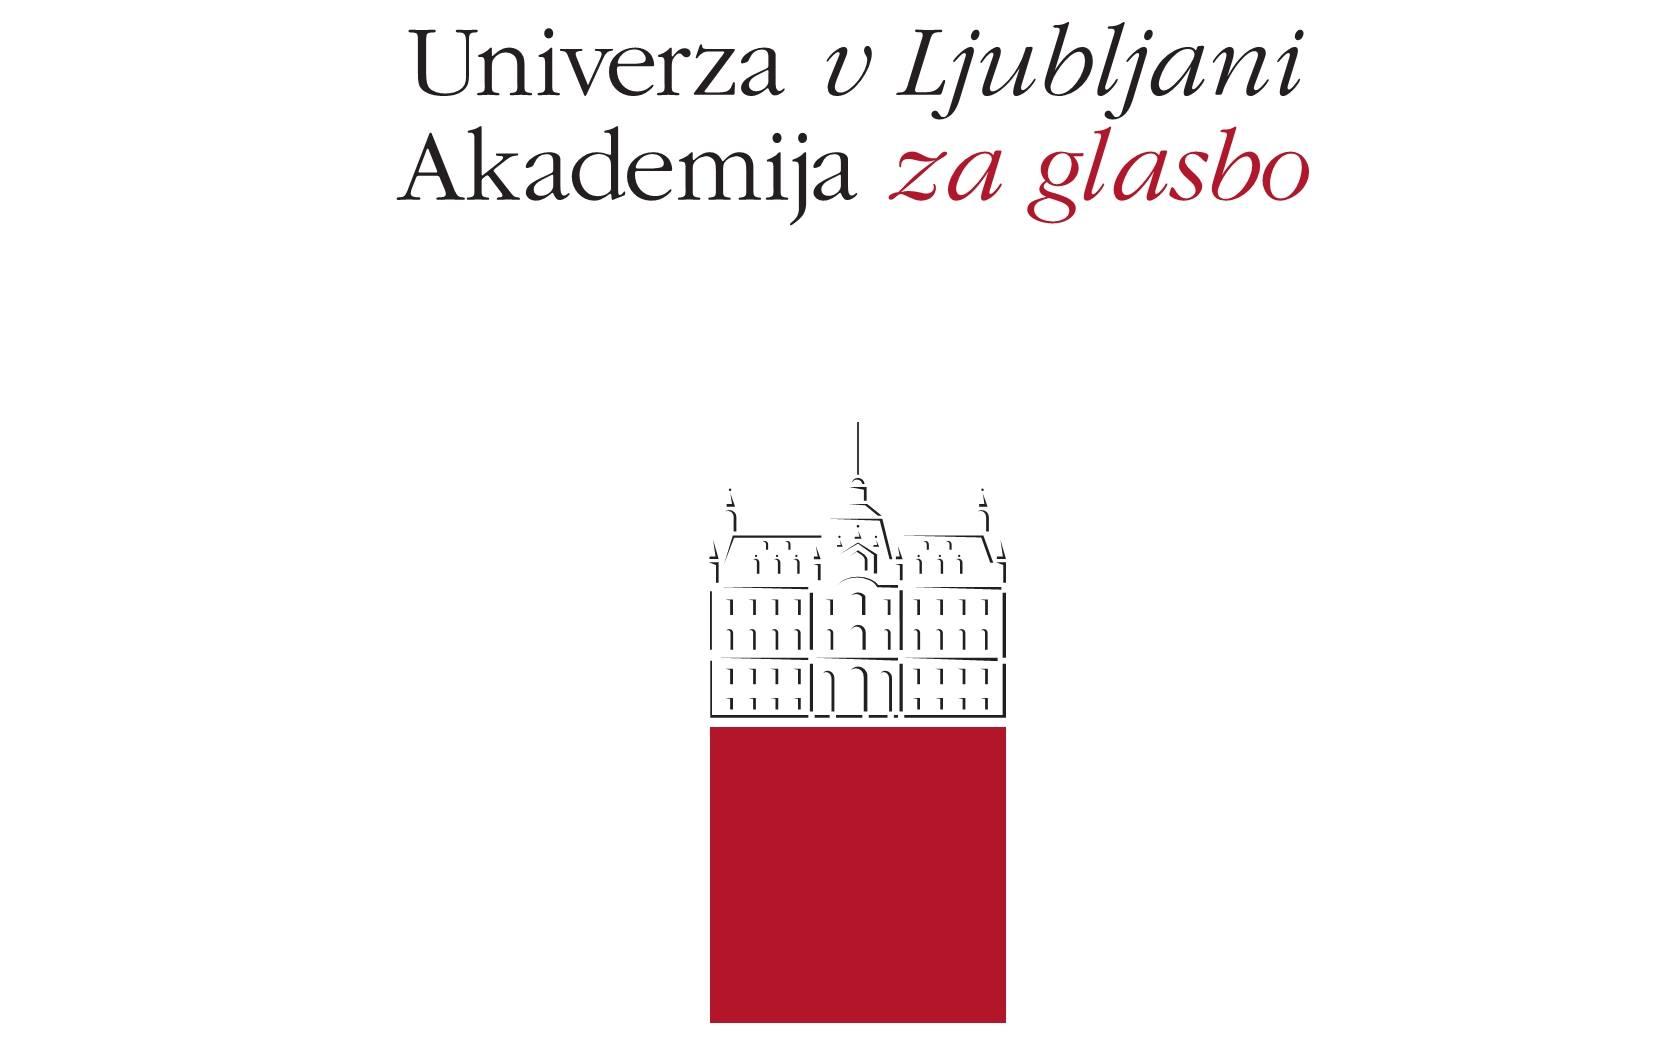 Akademija za glasbo Ljubljana (Academy of Music Ljubljana)